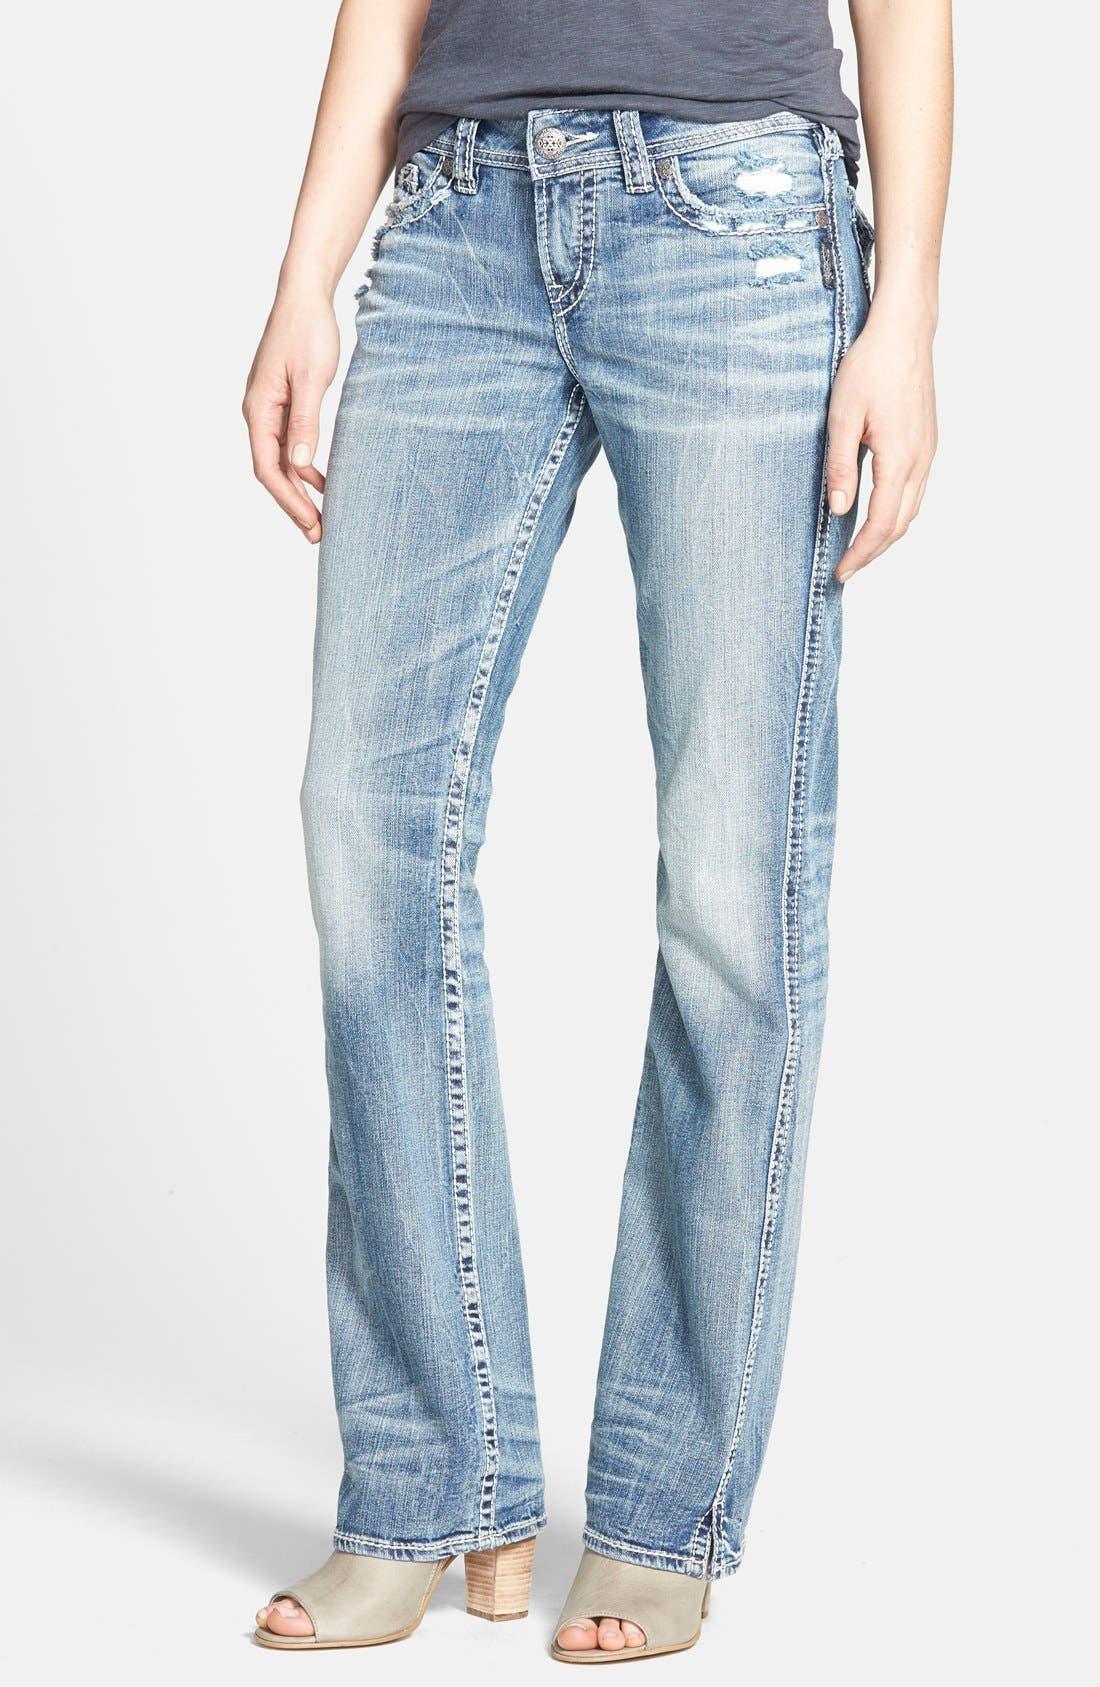 Main Image - Silver Jeans Co. 'Suki' Distressed Flap Pocket Slim Bootcut Jeans (Indigo)